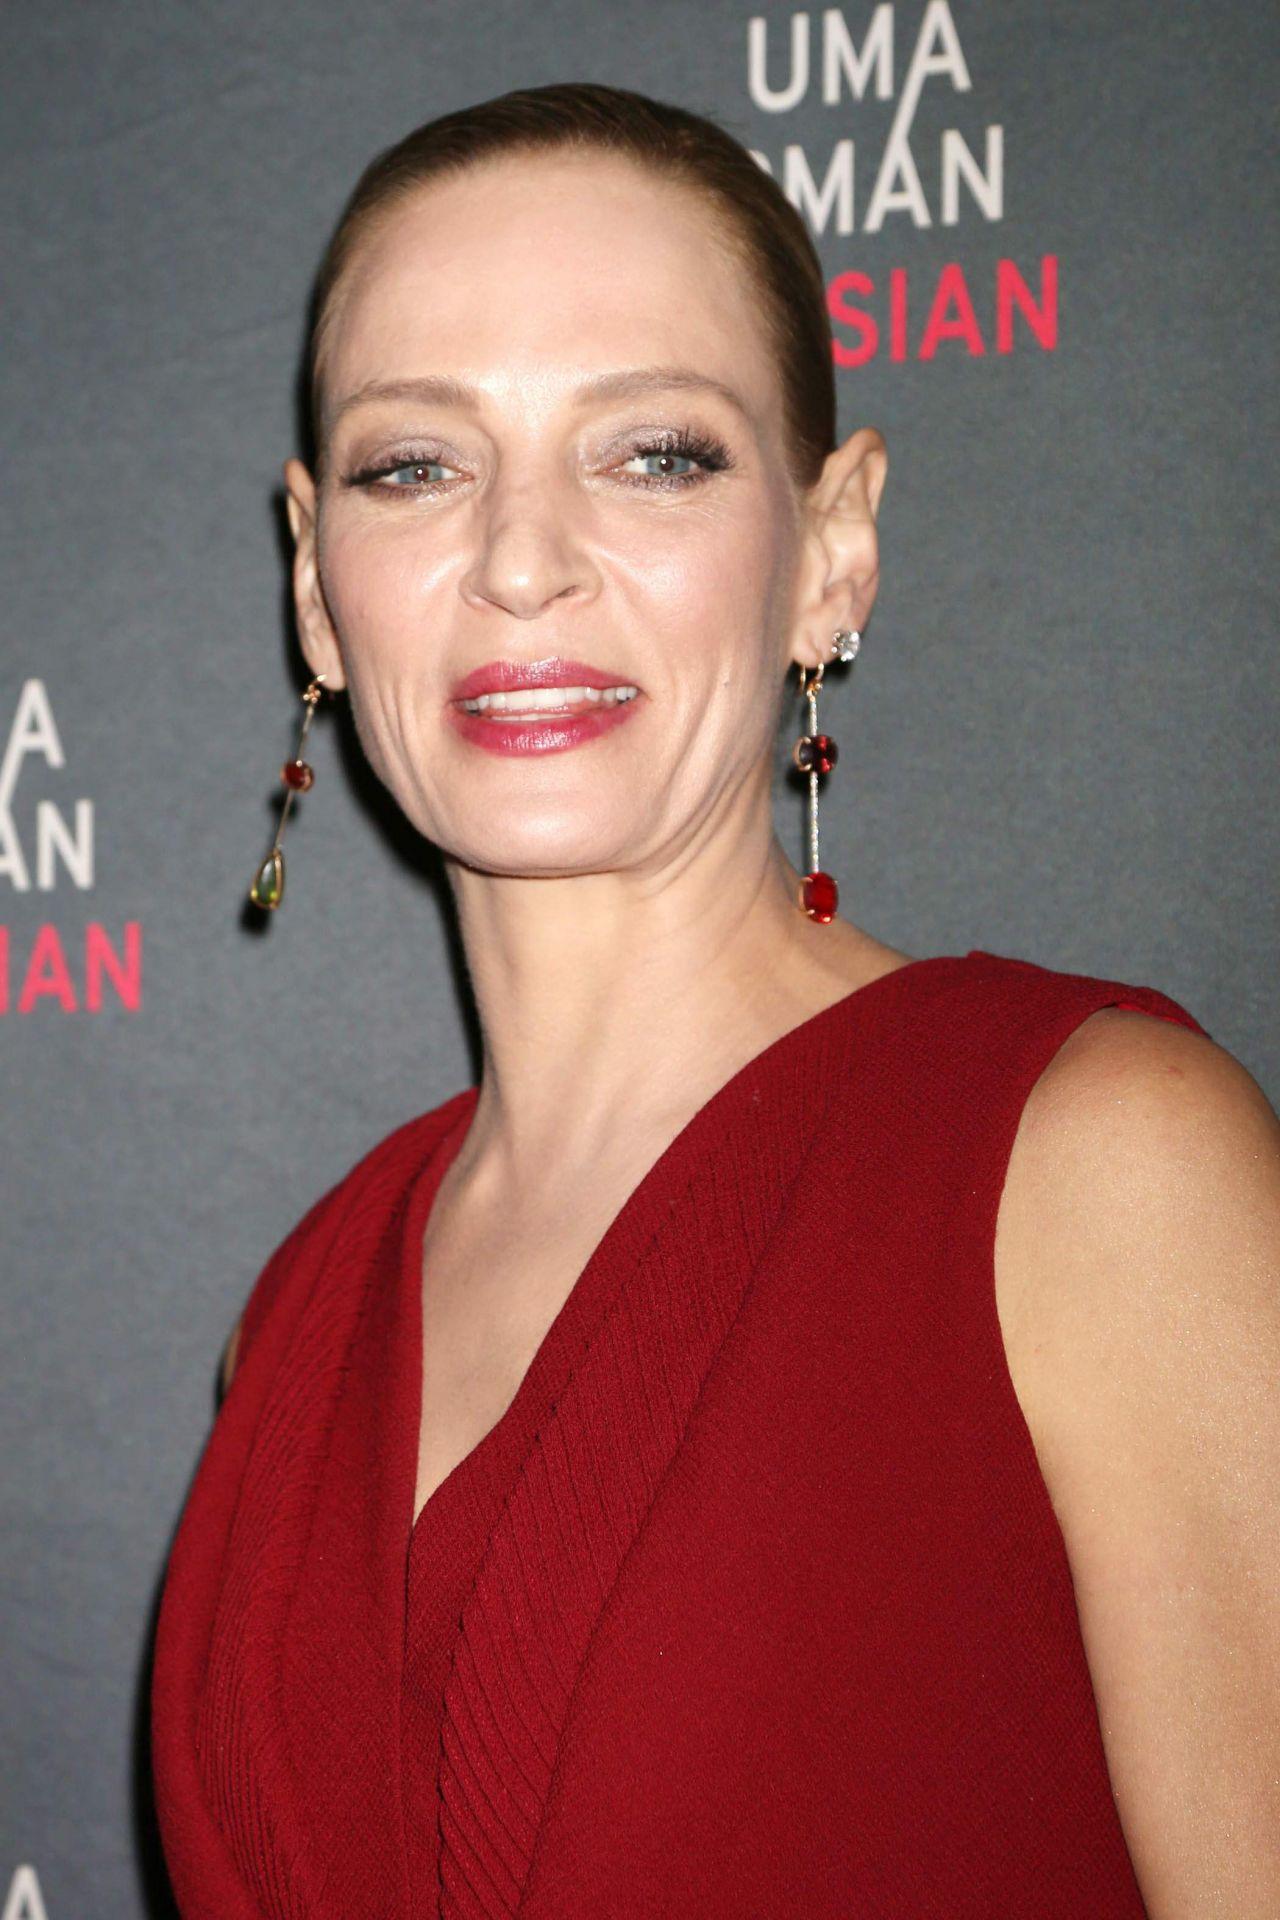 Uma Thurman - Parisian Woman Opening Night in NYC Uma Thurman